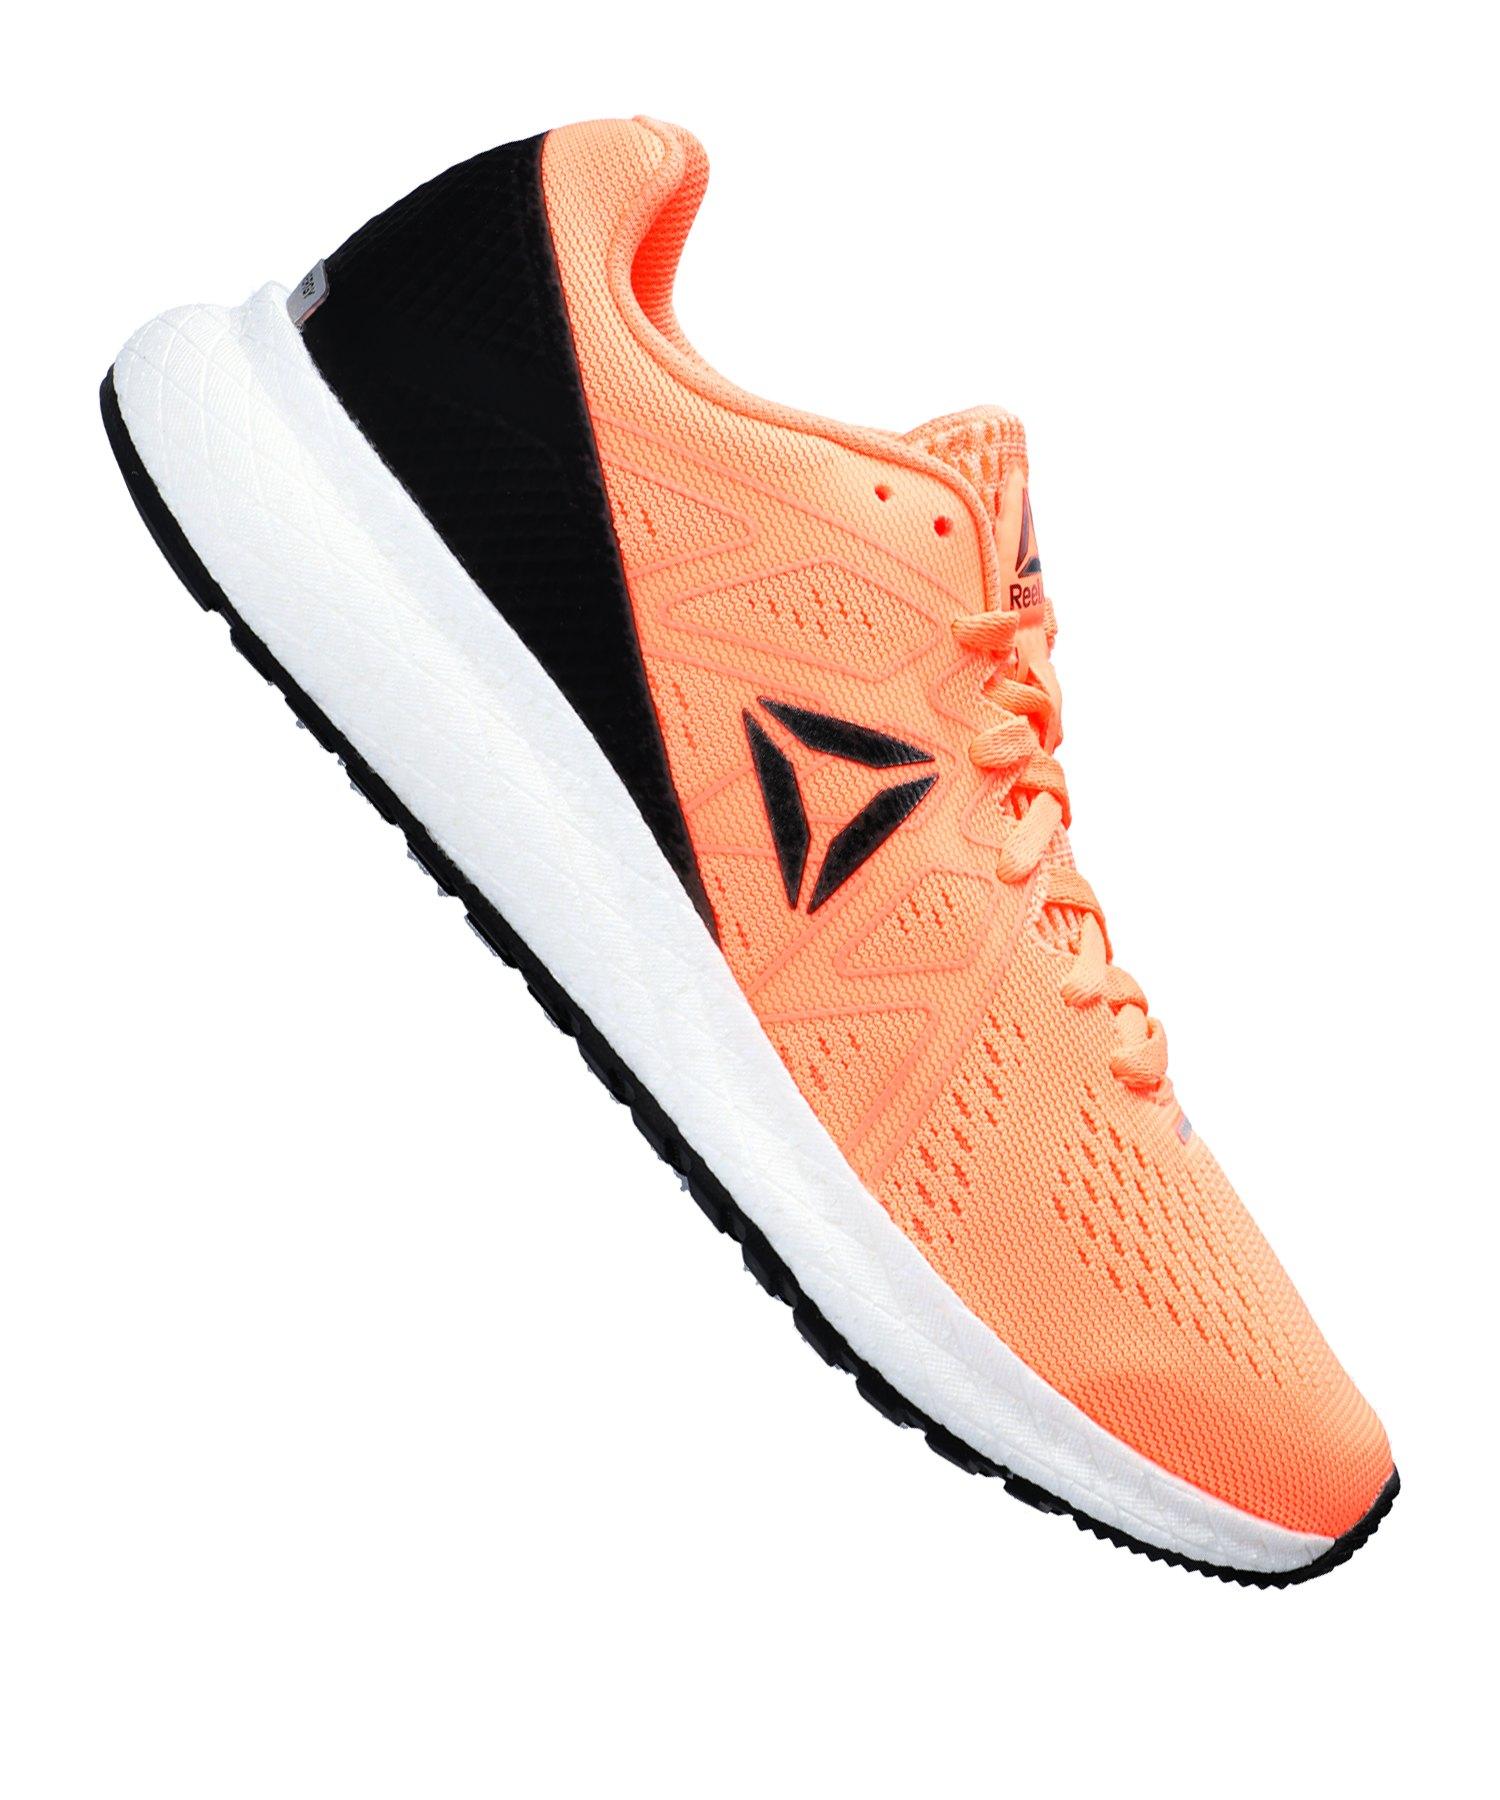 Reebok Forever Floatride Running Damen Orange - orange